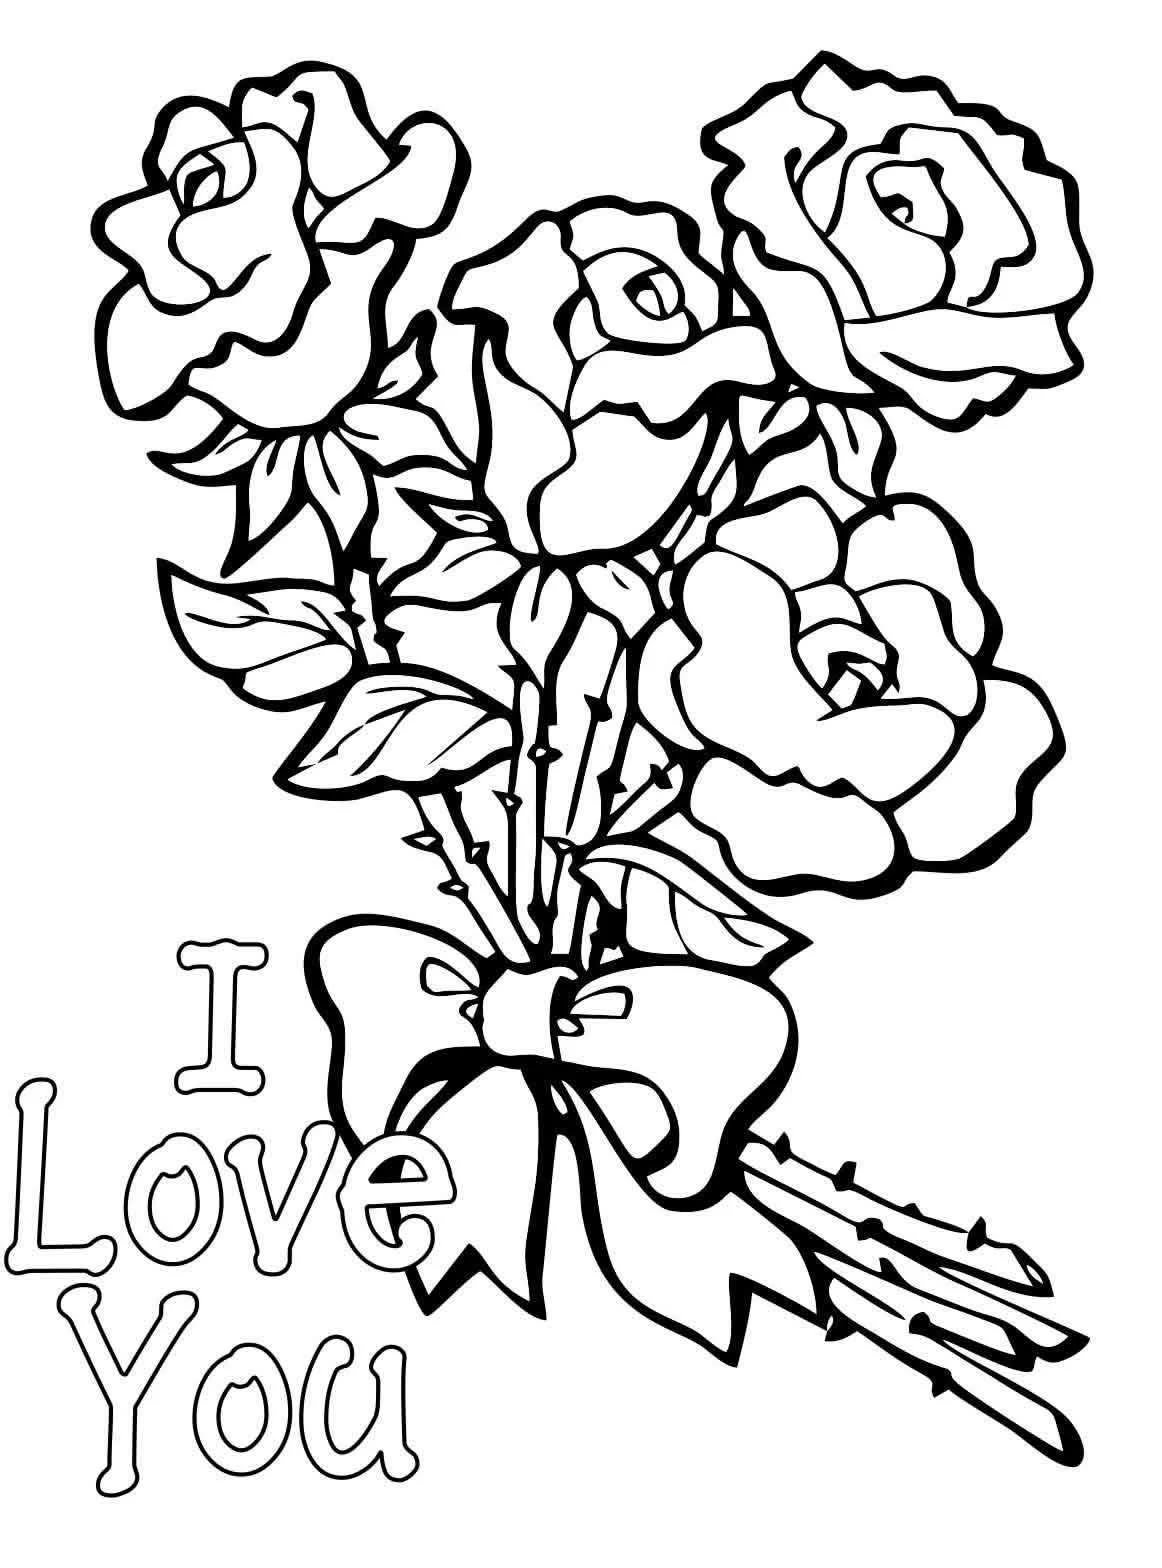 Открытка цветочки раскраска, фон зимний